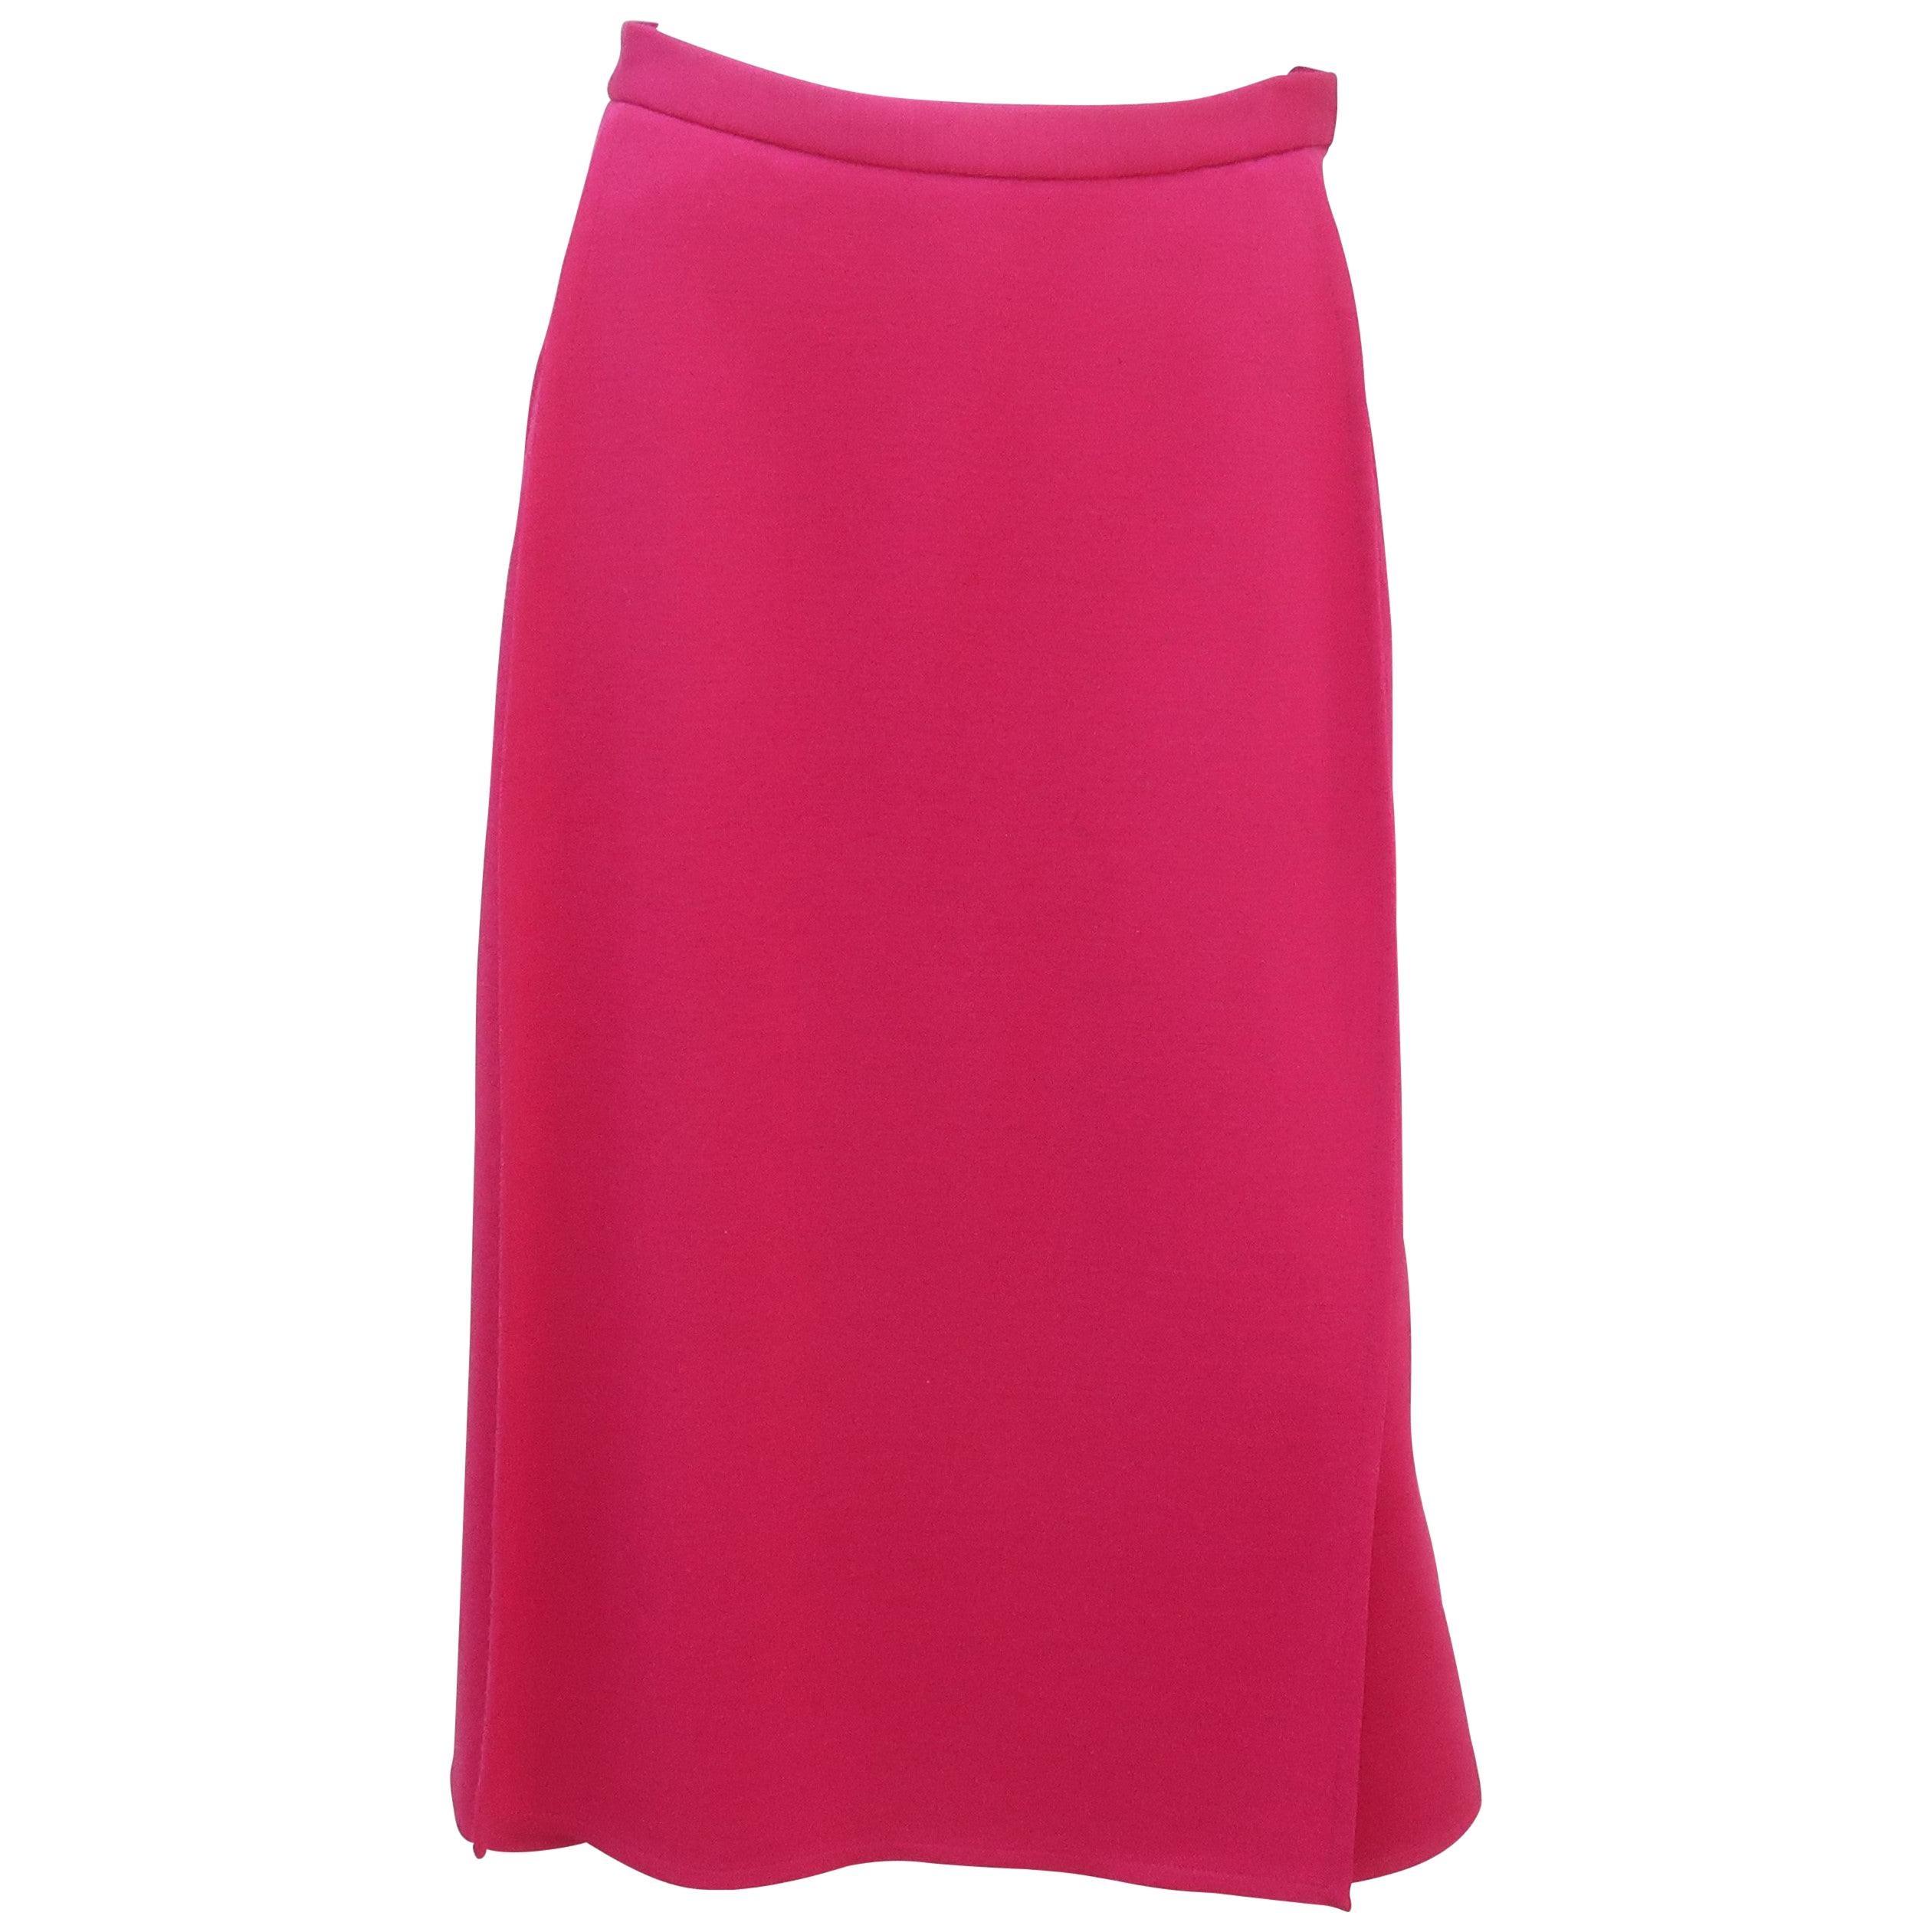 Sonia Rykiel Hot Pink Culottes Skirt, 1980's